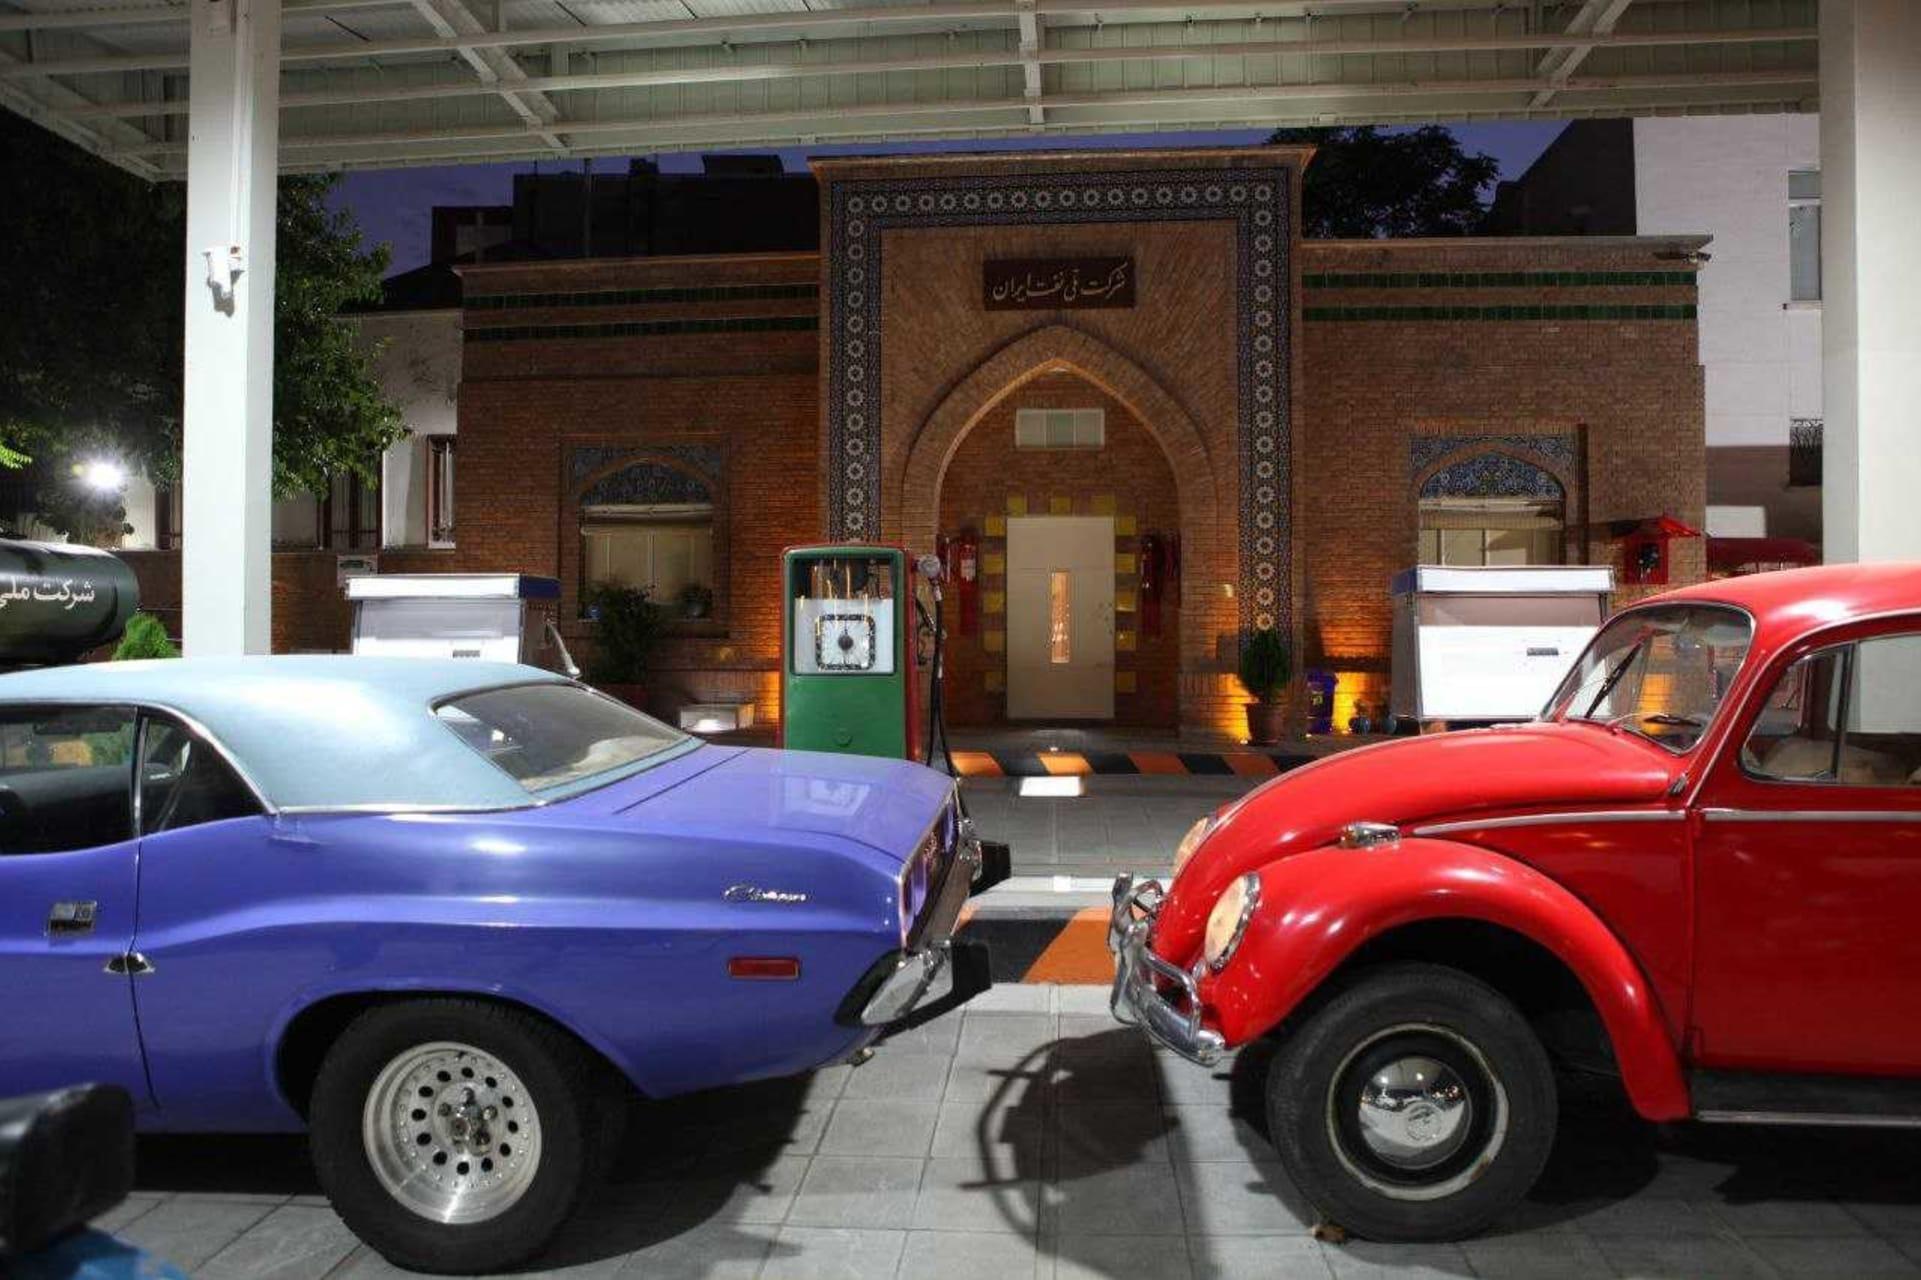 Tehran - Gas station museum